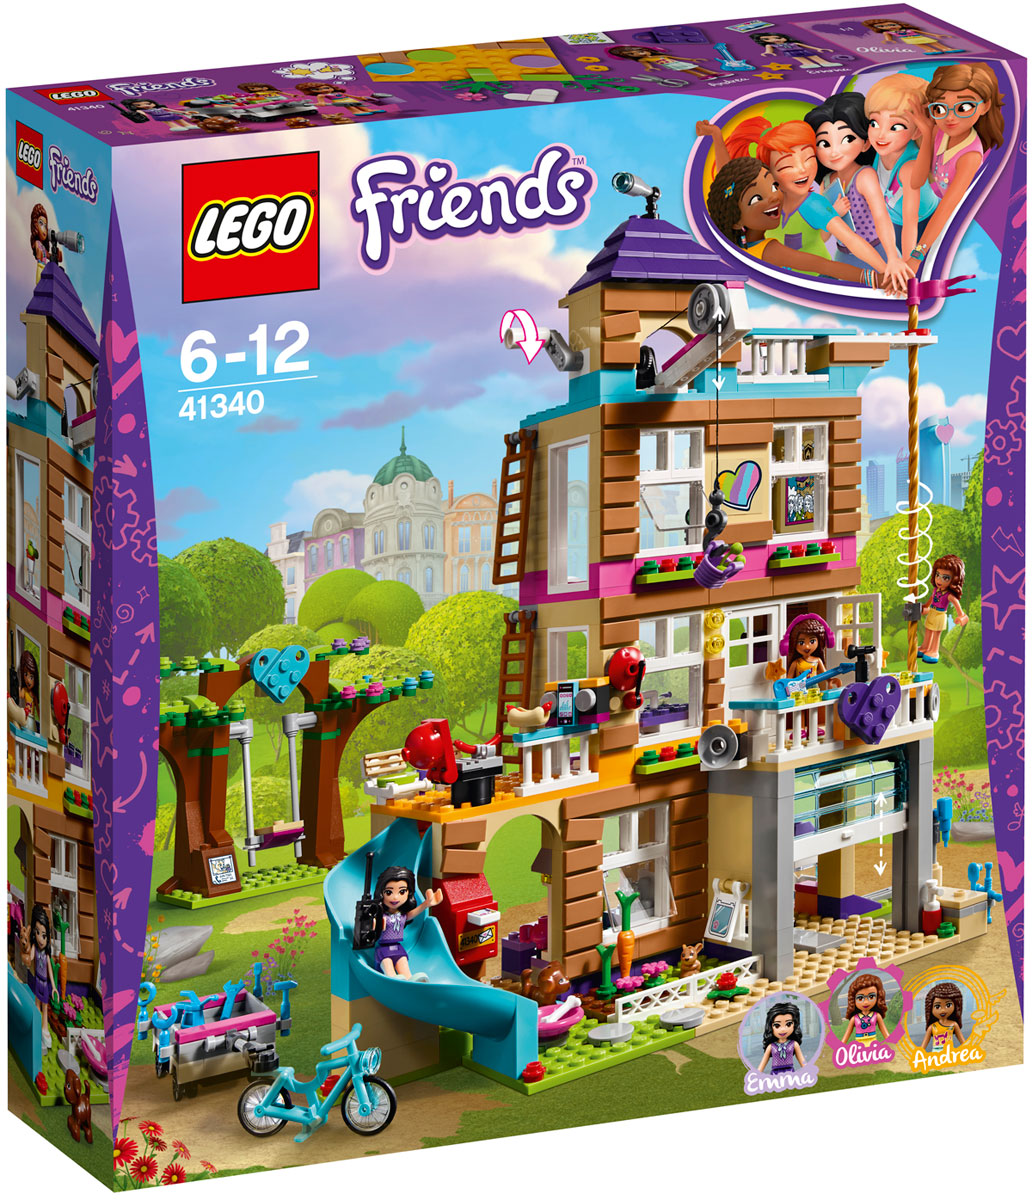 LEGO Friends Конструктор Дом дружбы 41340 lego конструктор lego friends 41340 дом дружбы